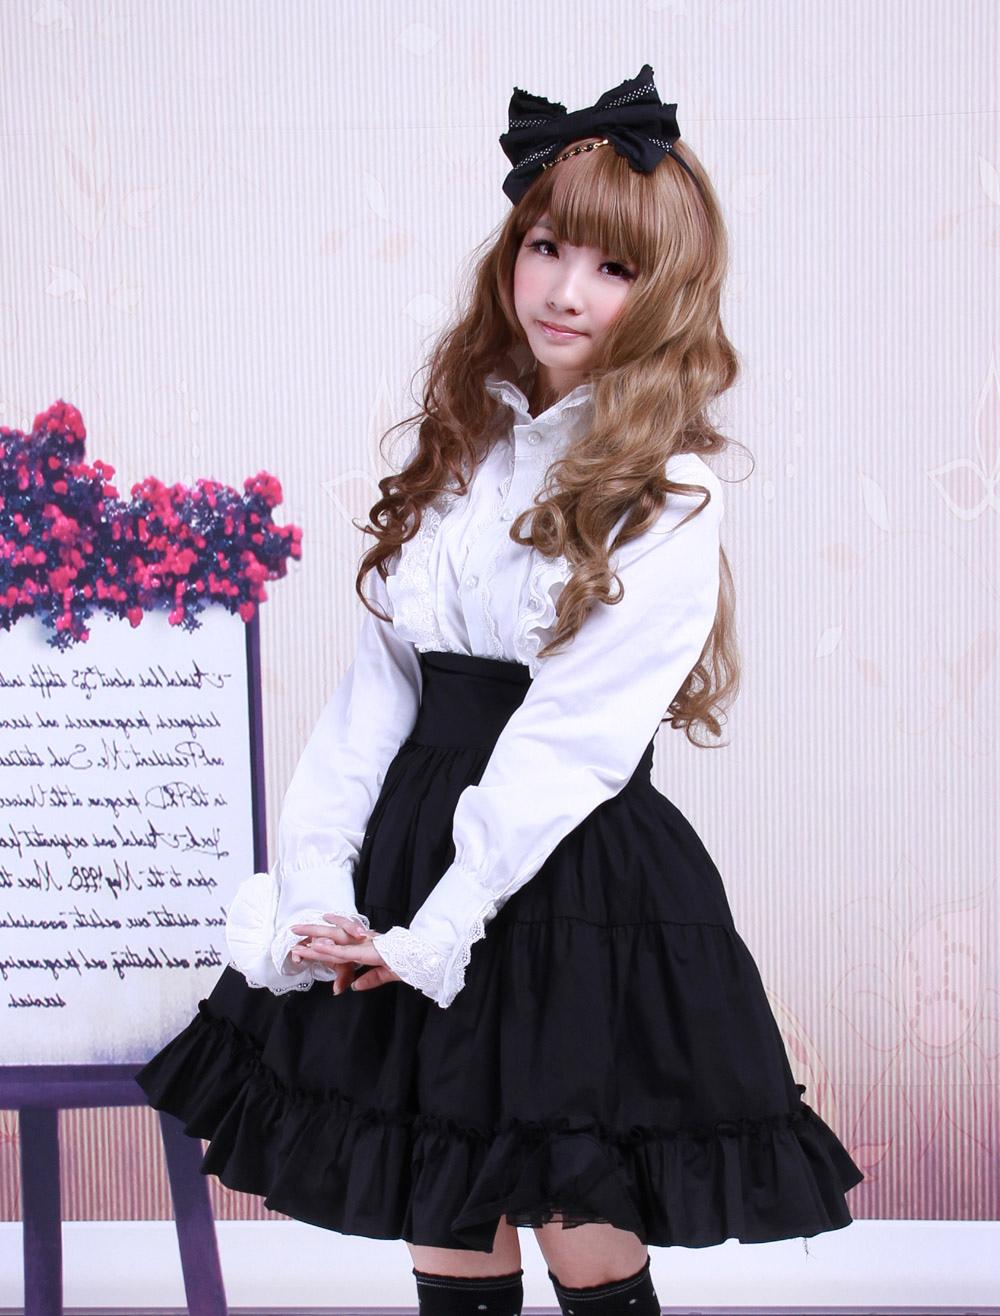 Buy Gothic Lolita Dress SK Black High Waist Ruffles Cotton Lolita Skirt for $46.99 in Milanoo store